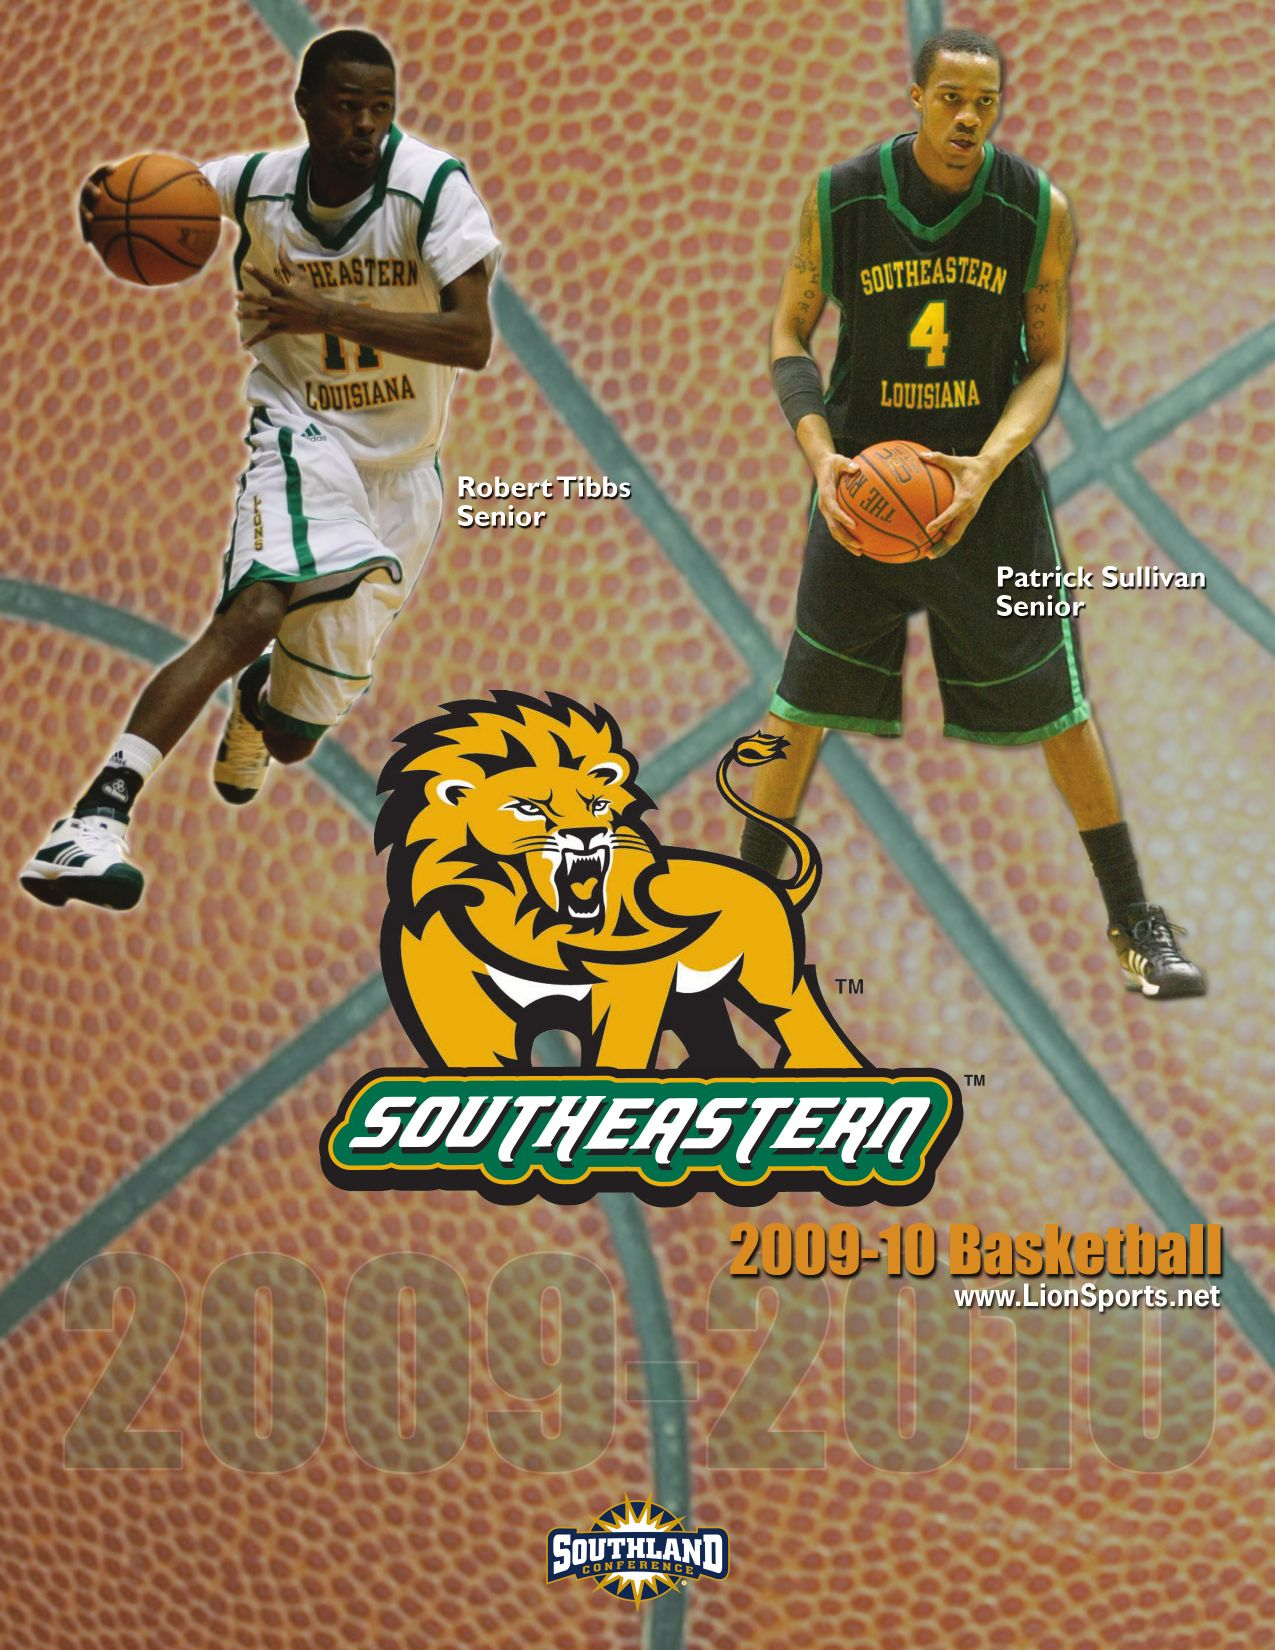 2009-10 Southeastern Louisiana Men s Basketball Media Guide by Southeastern  Louisiana University Athletics - issuu 0b504d3ec